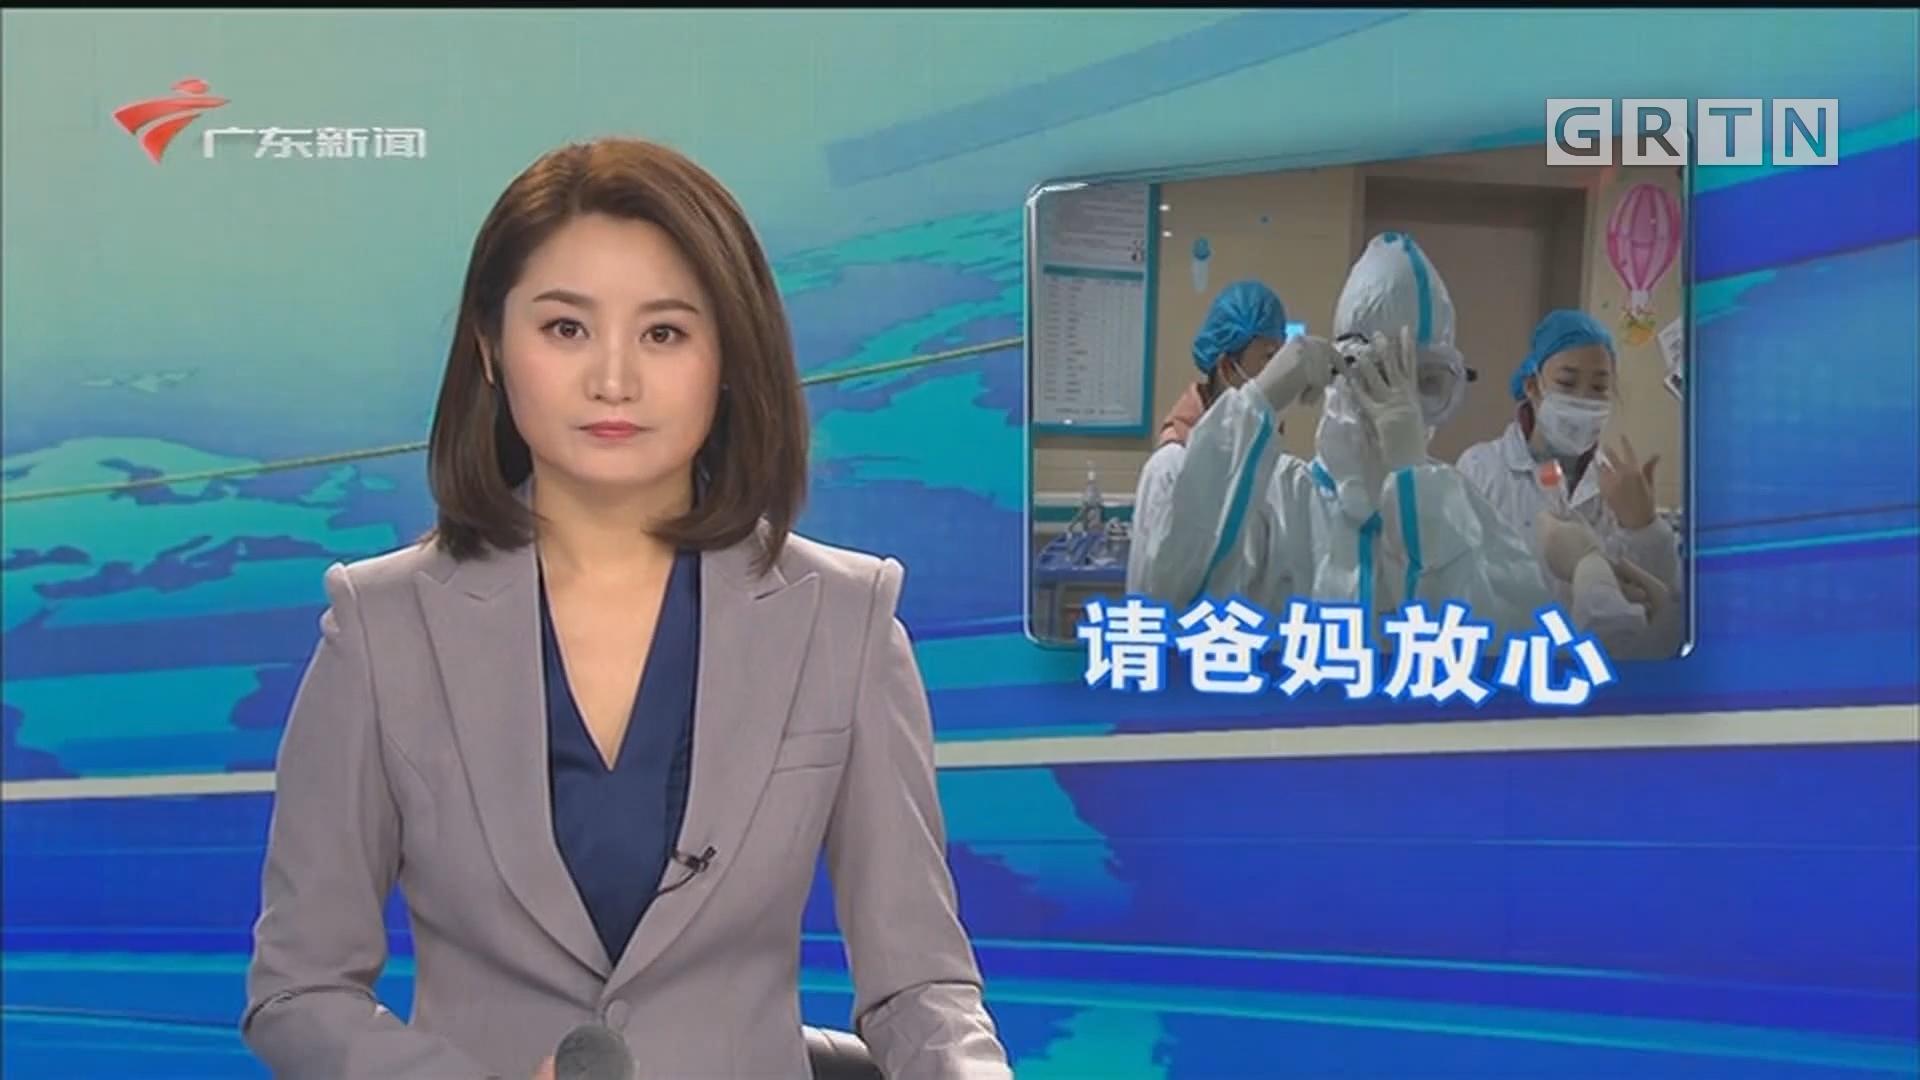 [HD][2020-02-03-15:00]正点播报:广州深圳新增共44例 广州首次在门把手上发现新型冠状病毒踪迹